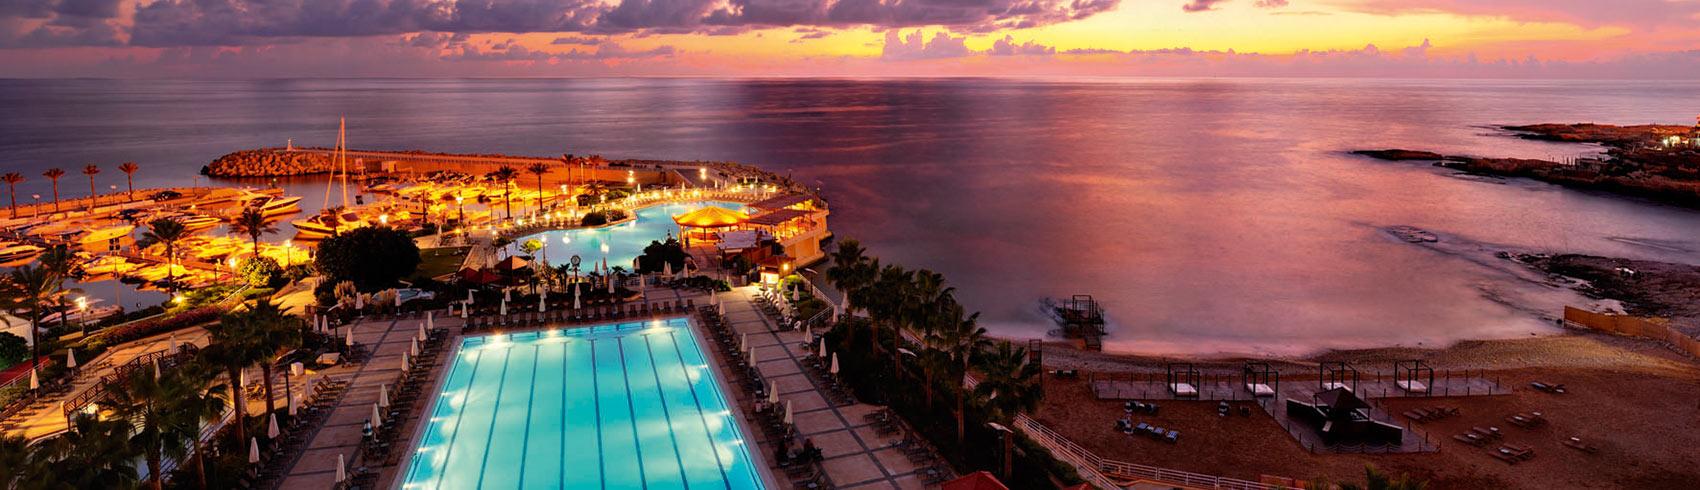 http://www.moevenpick-hotels.com/en/middle-east/lebanon/beirut/hotel-beirut/overview/